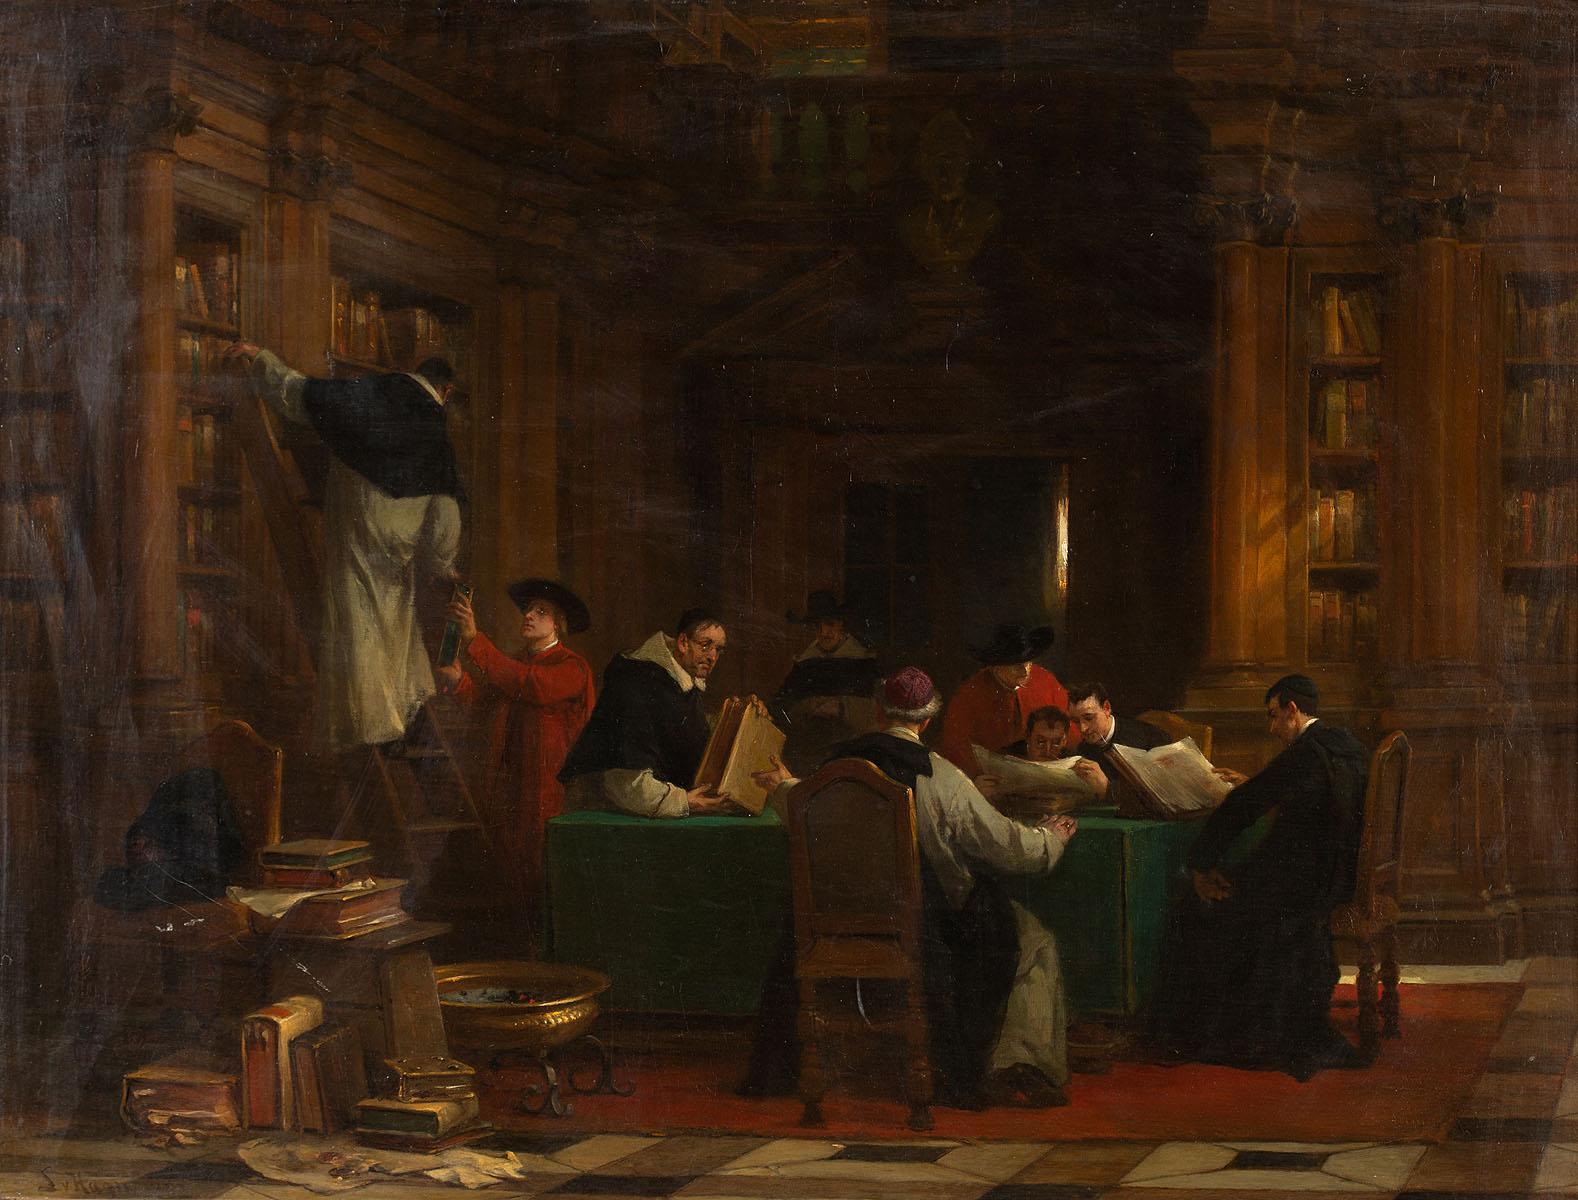 Biblioteka, 1882